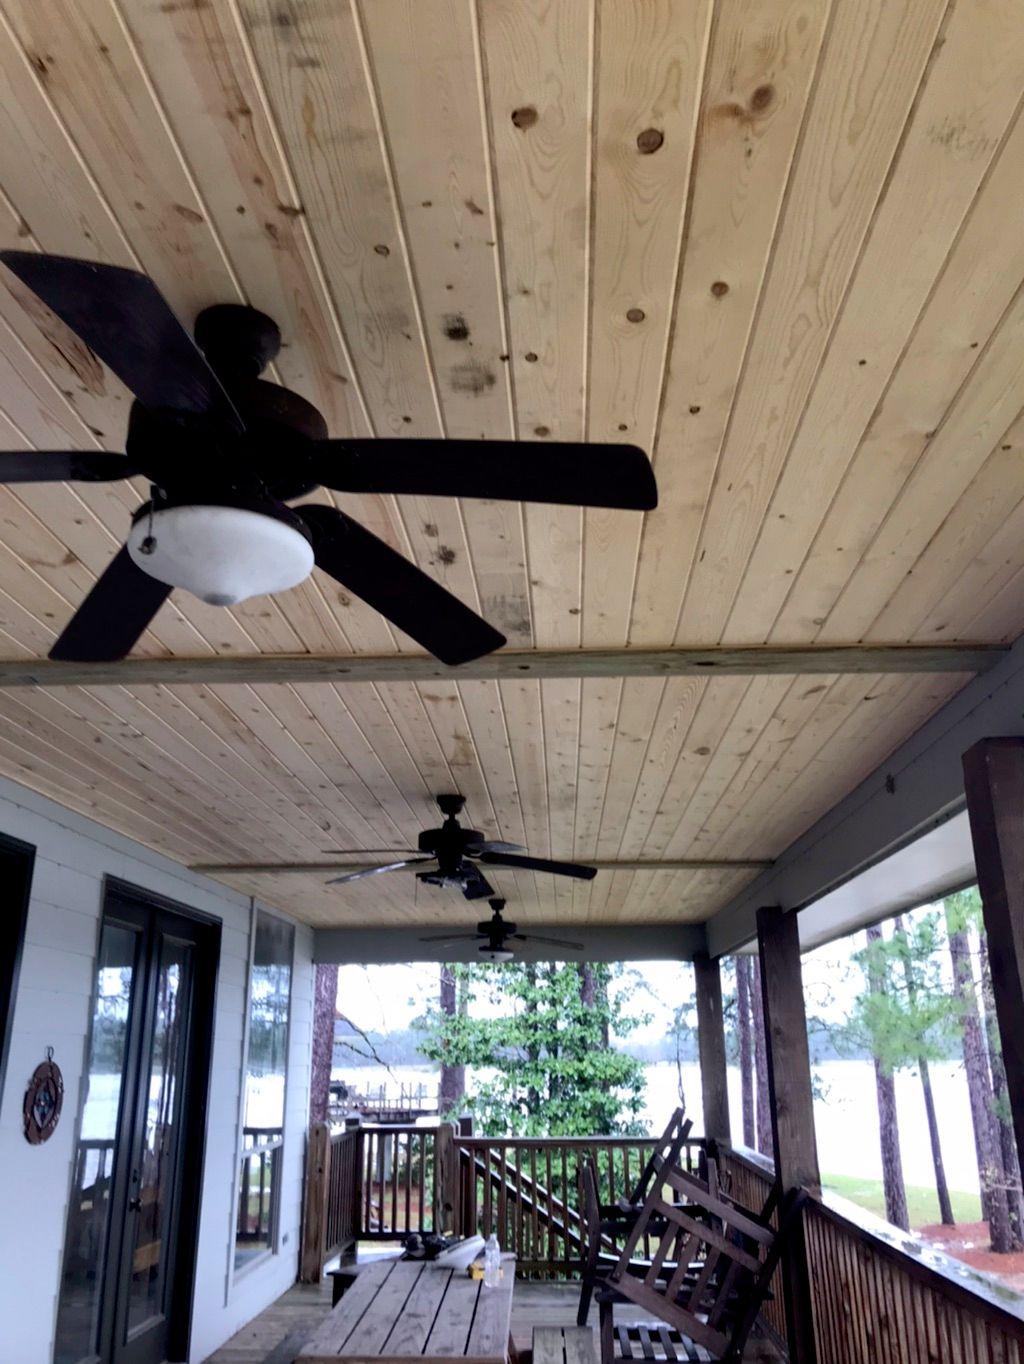 McCormicks remolding and home improvement LLC